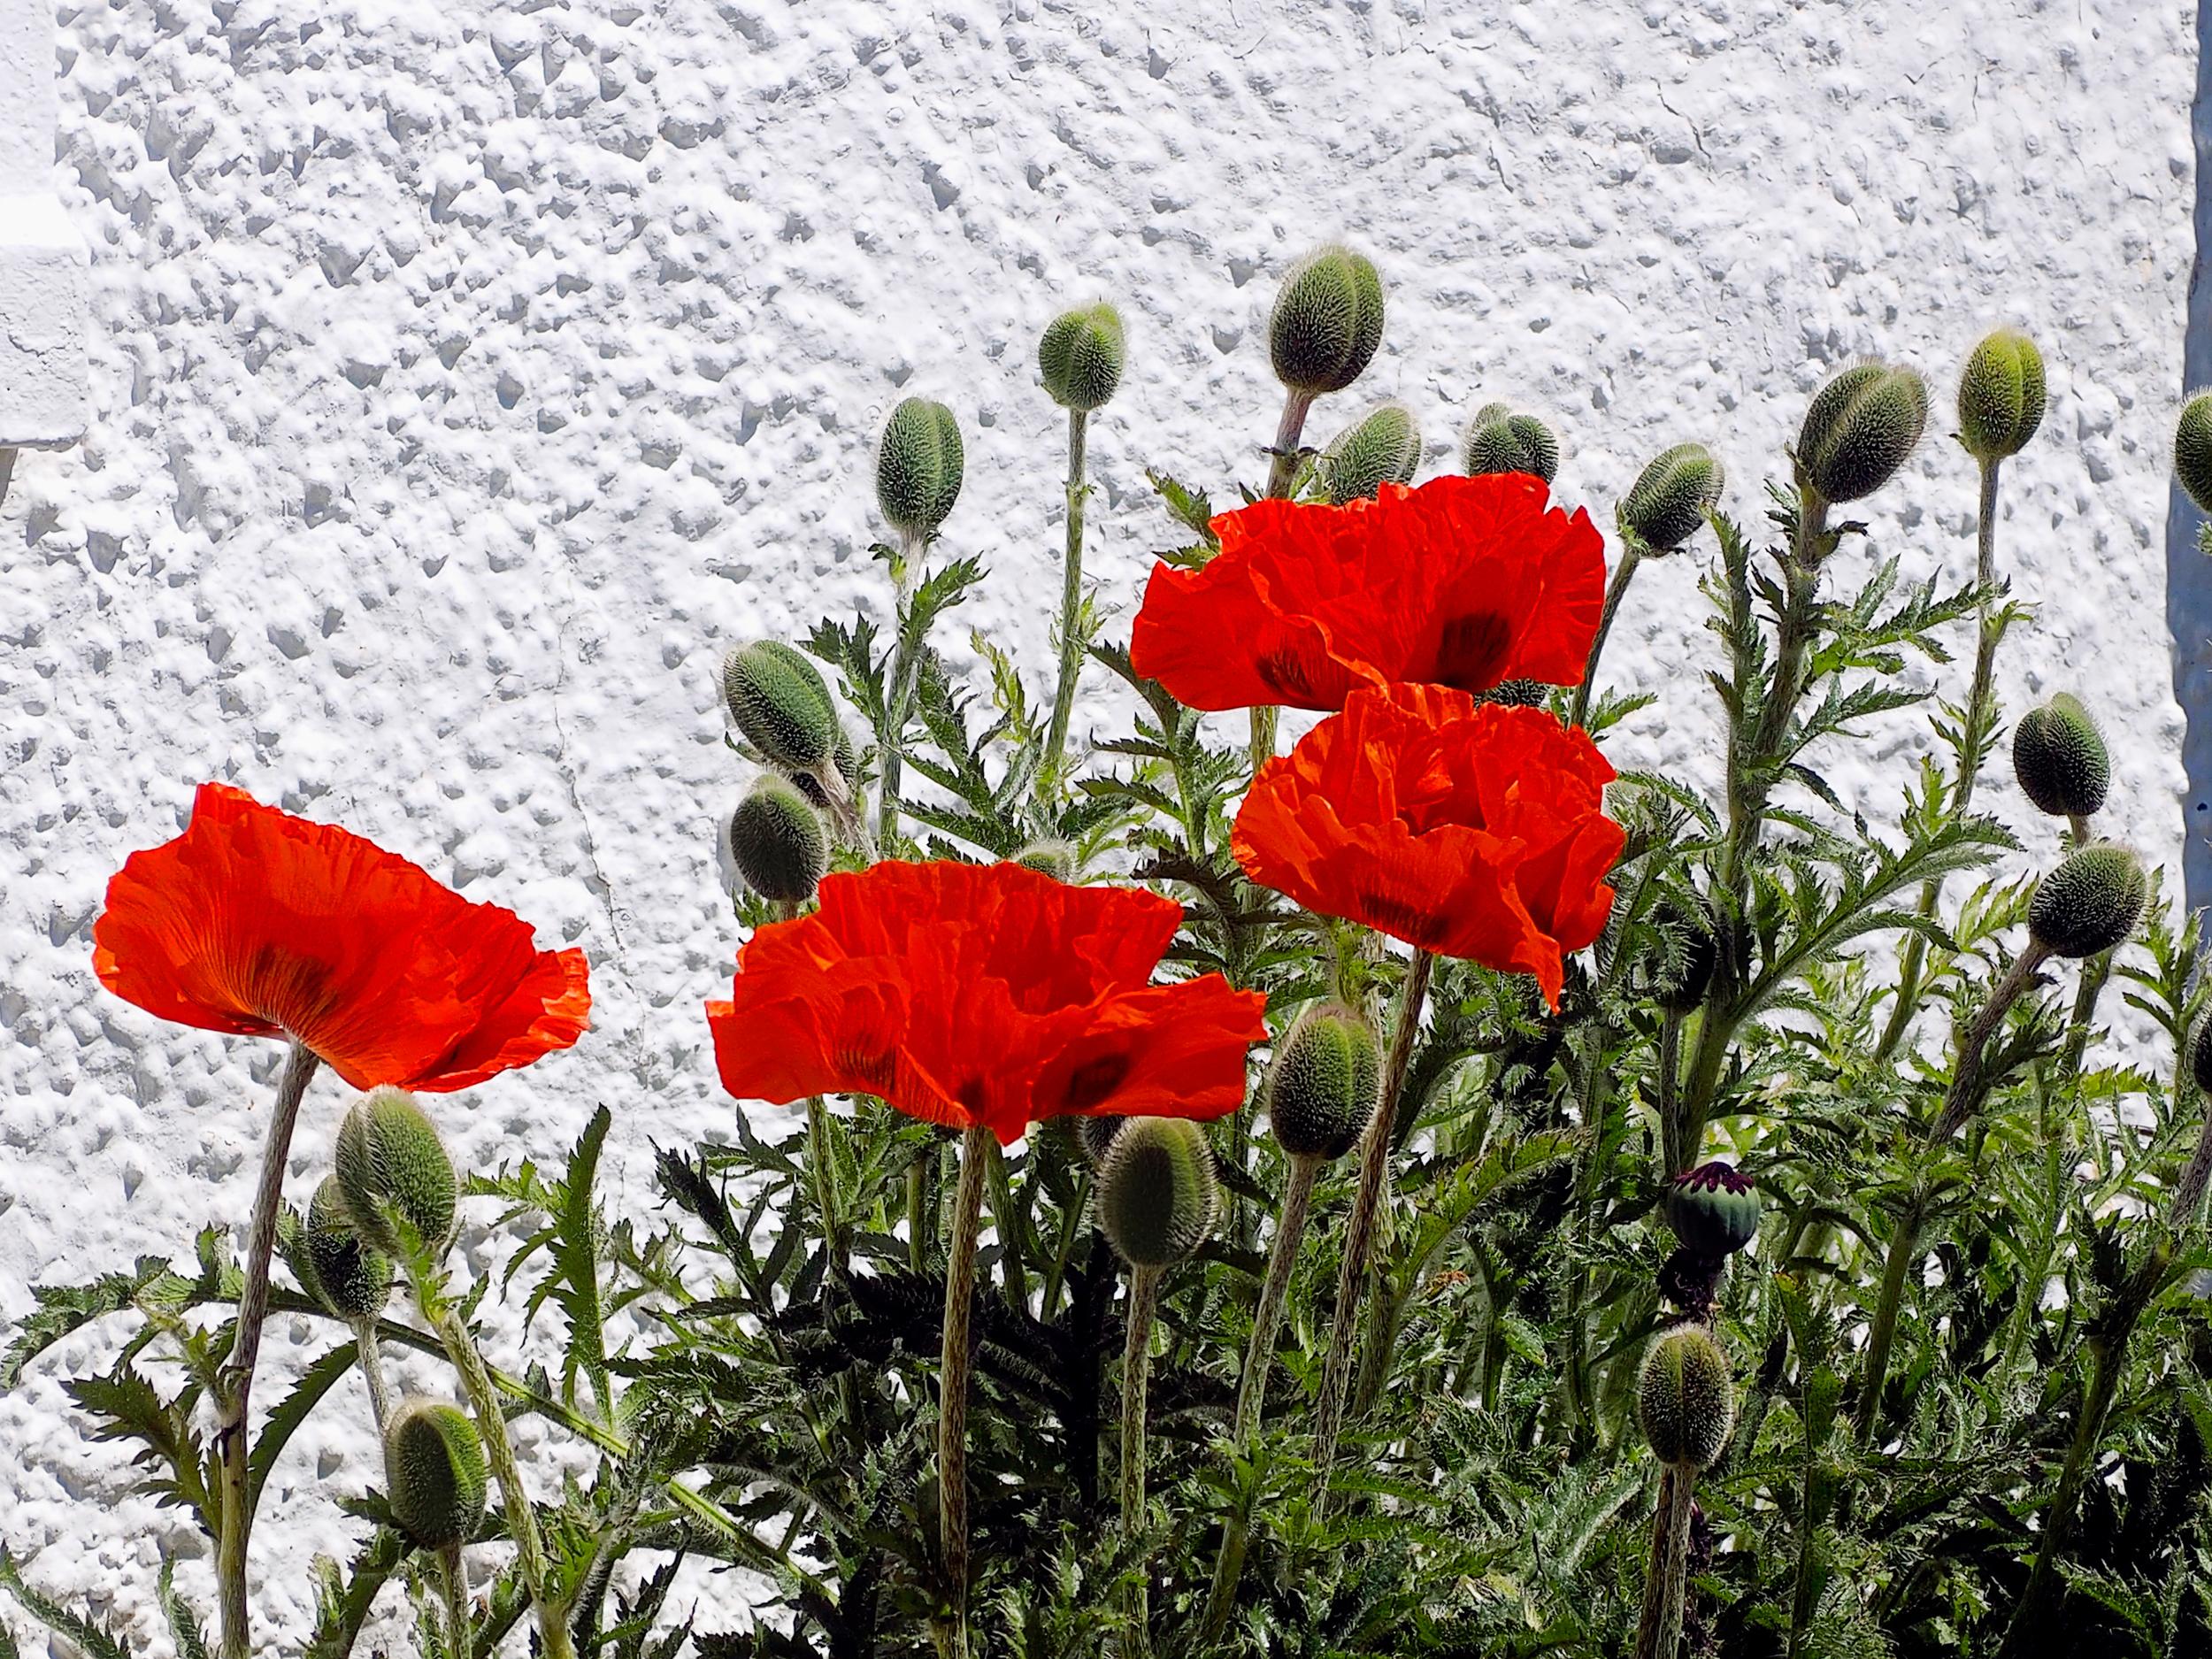 Poppies_B280691.jpg